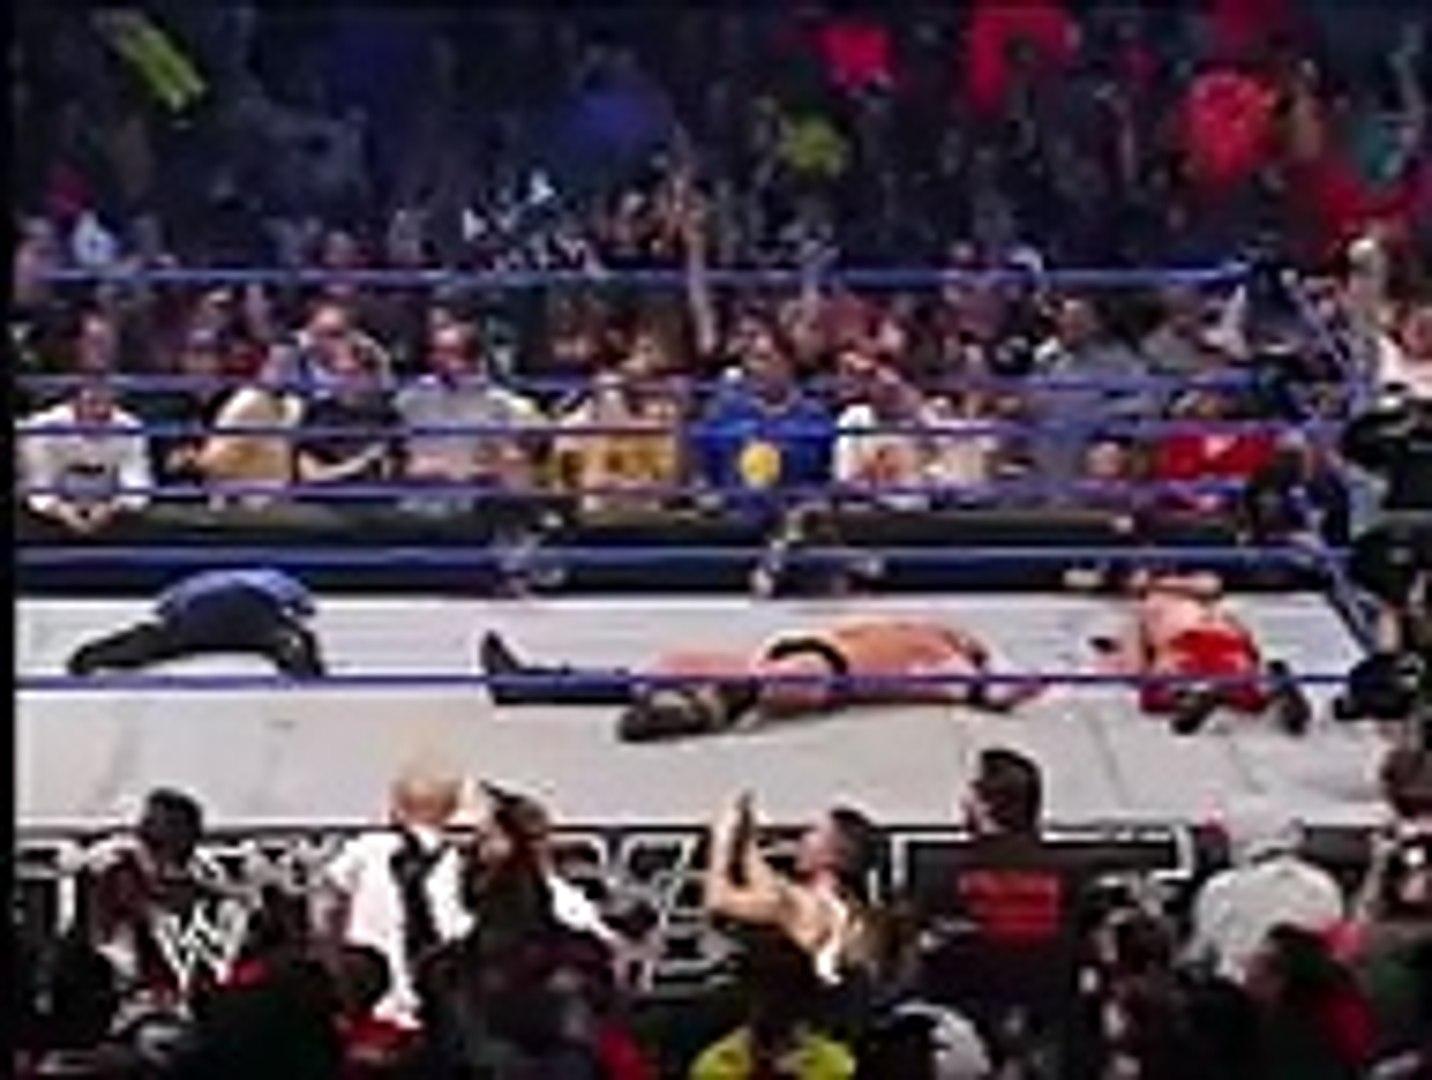 WWE Wrestling _ Eddie Guerrero wins WWE Championship - Watch Top New WWE Videos, tv series movies 20